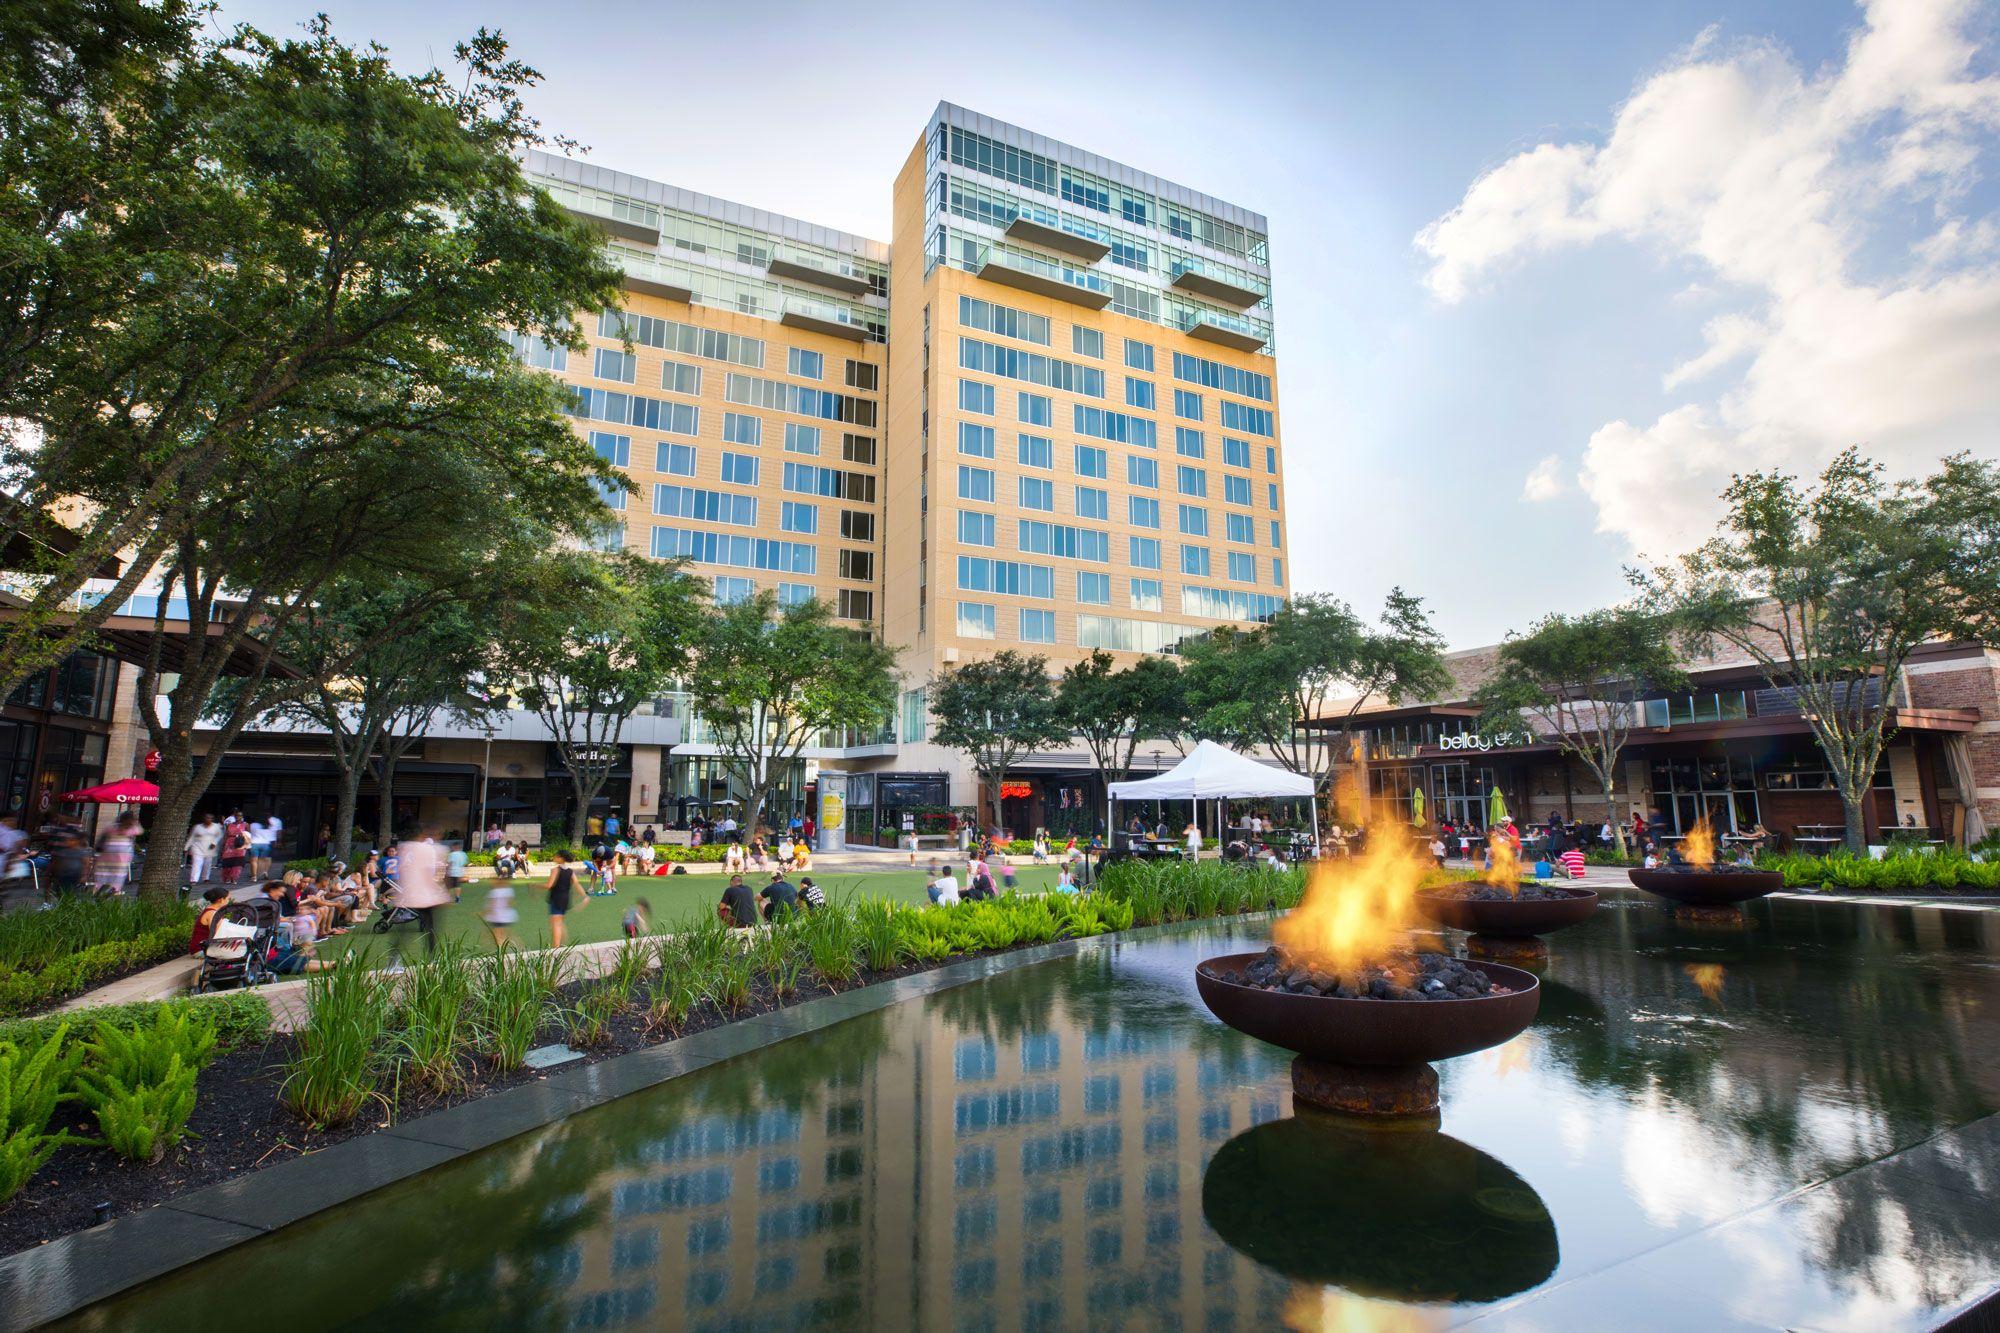 CITYCENTRE in Houston, Texas